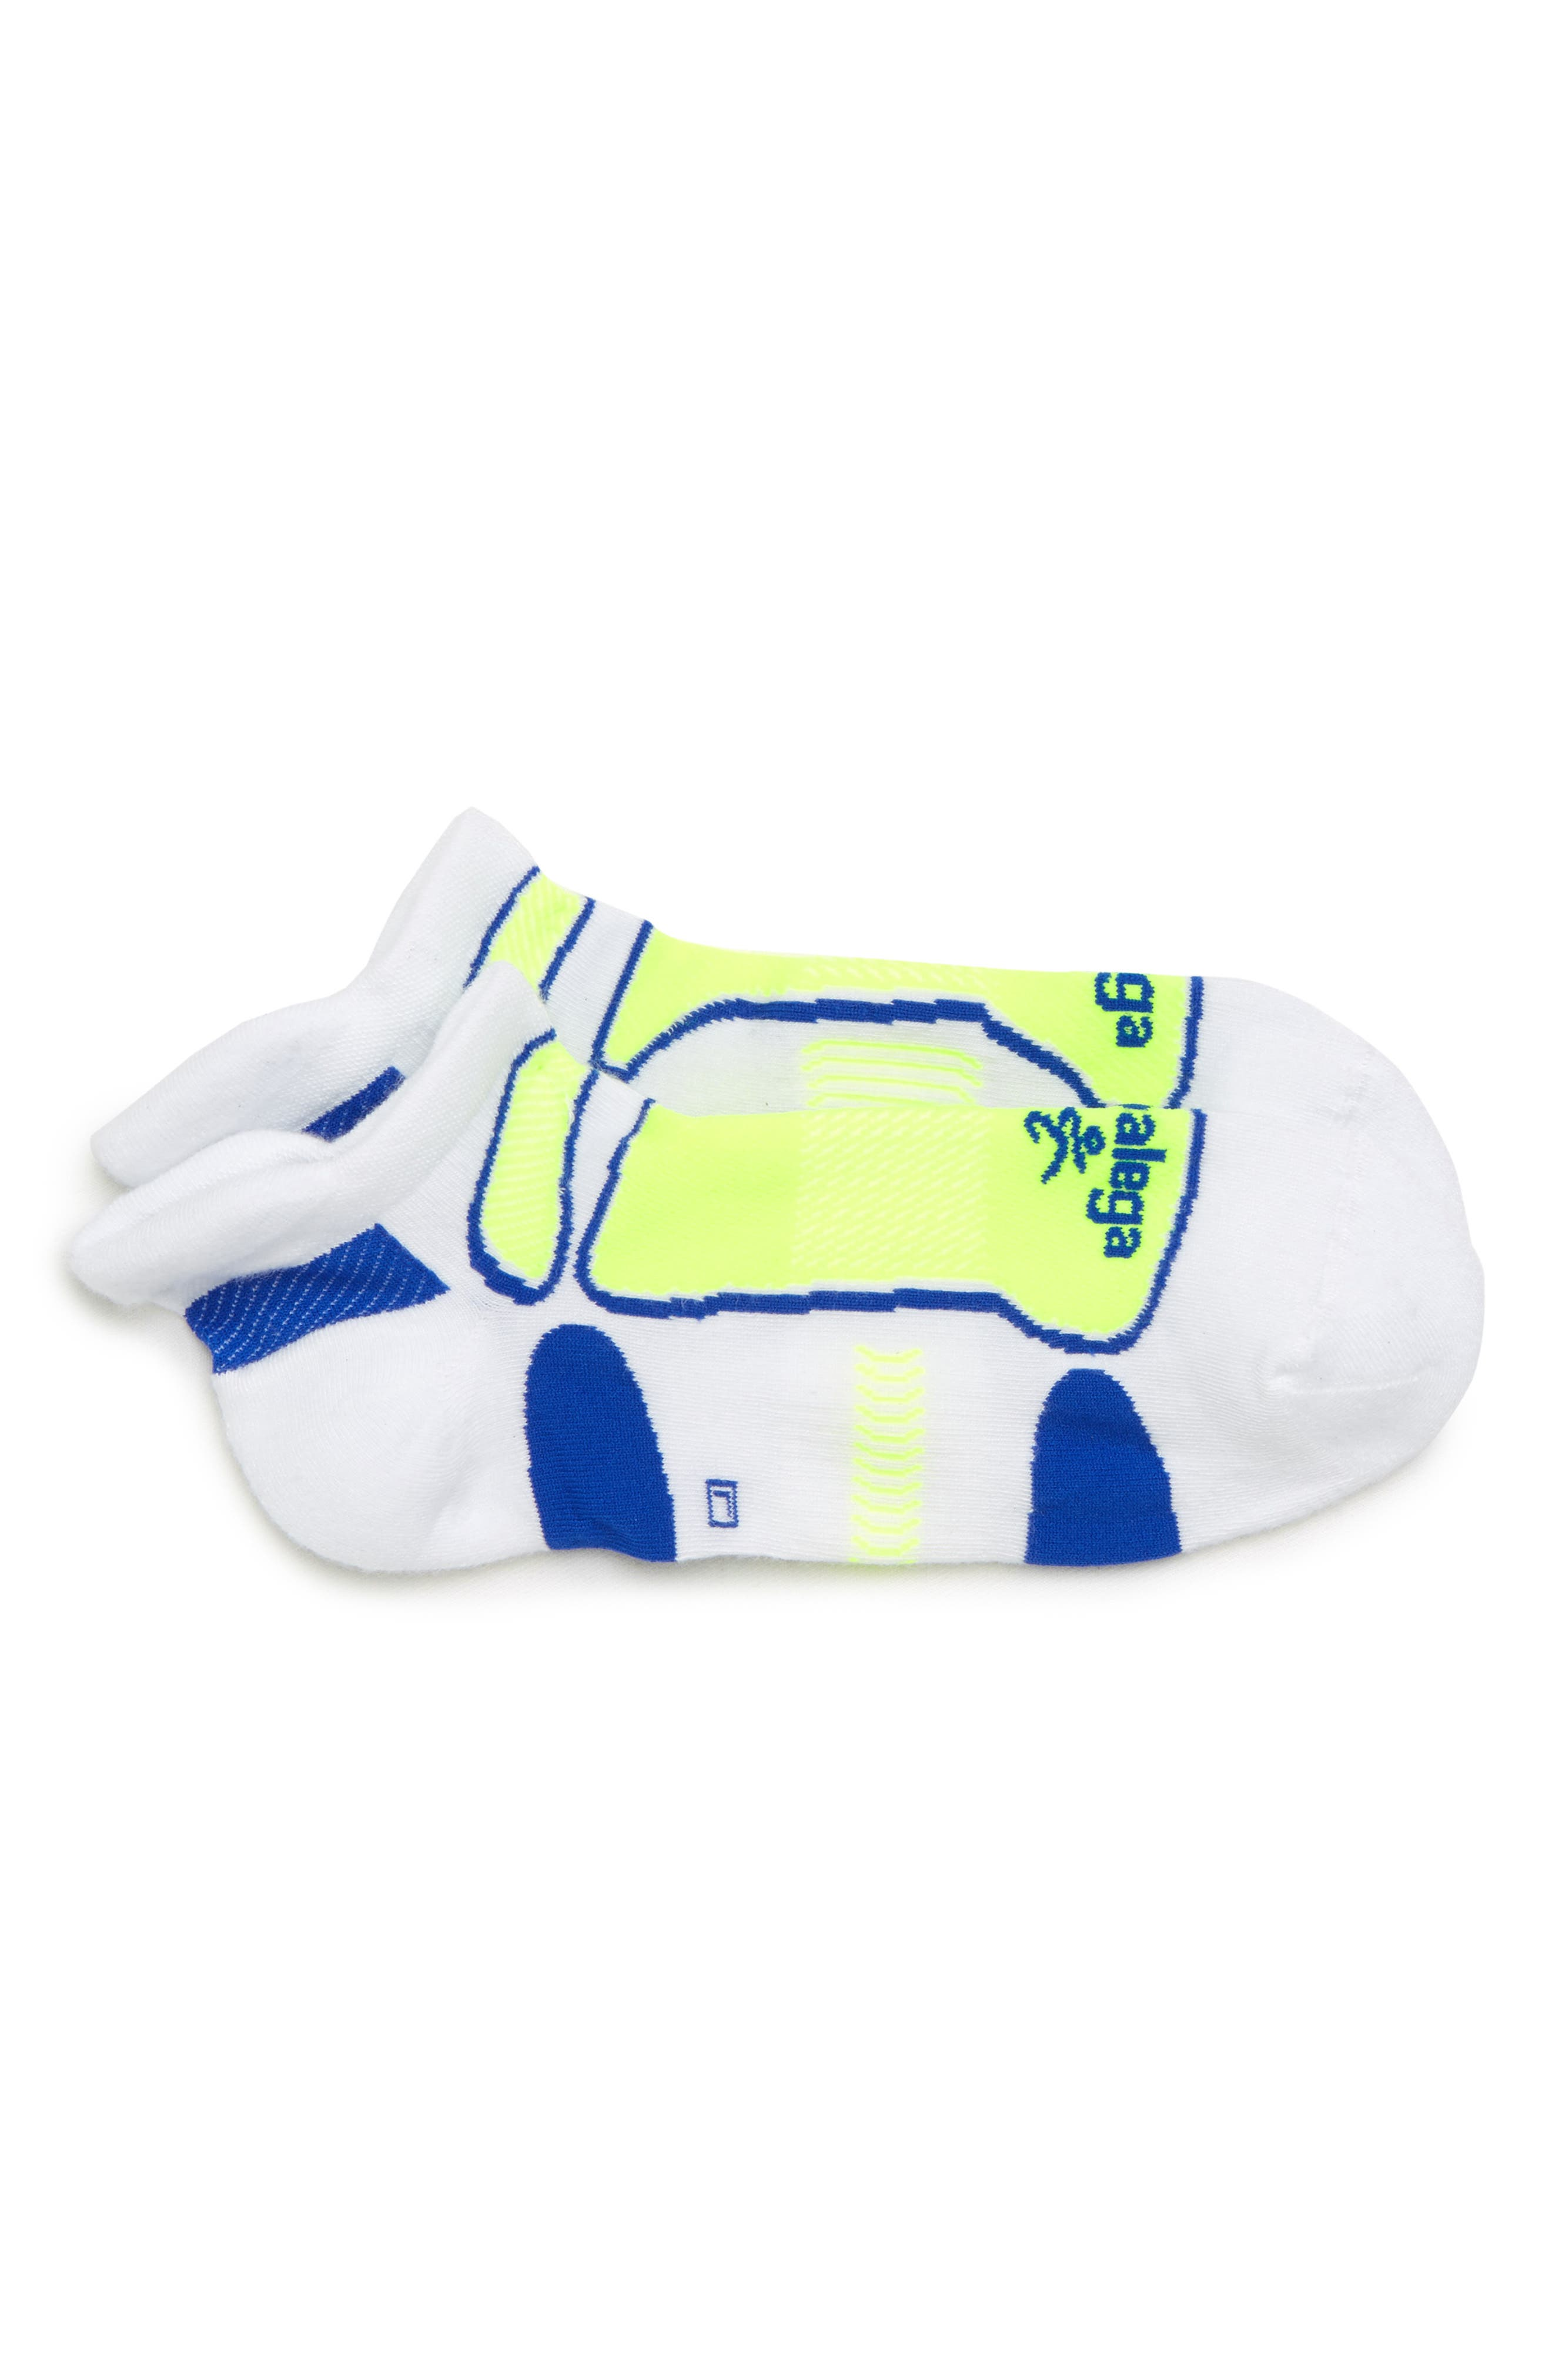 Ultra Light Socks,                         Main,                         color, White/ Neon Yellow/ Royal